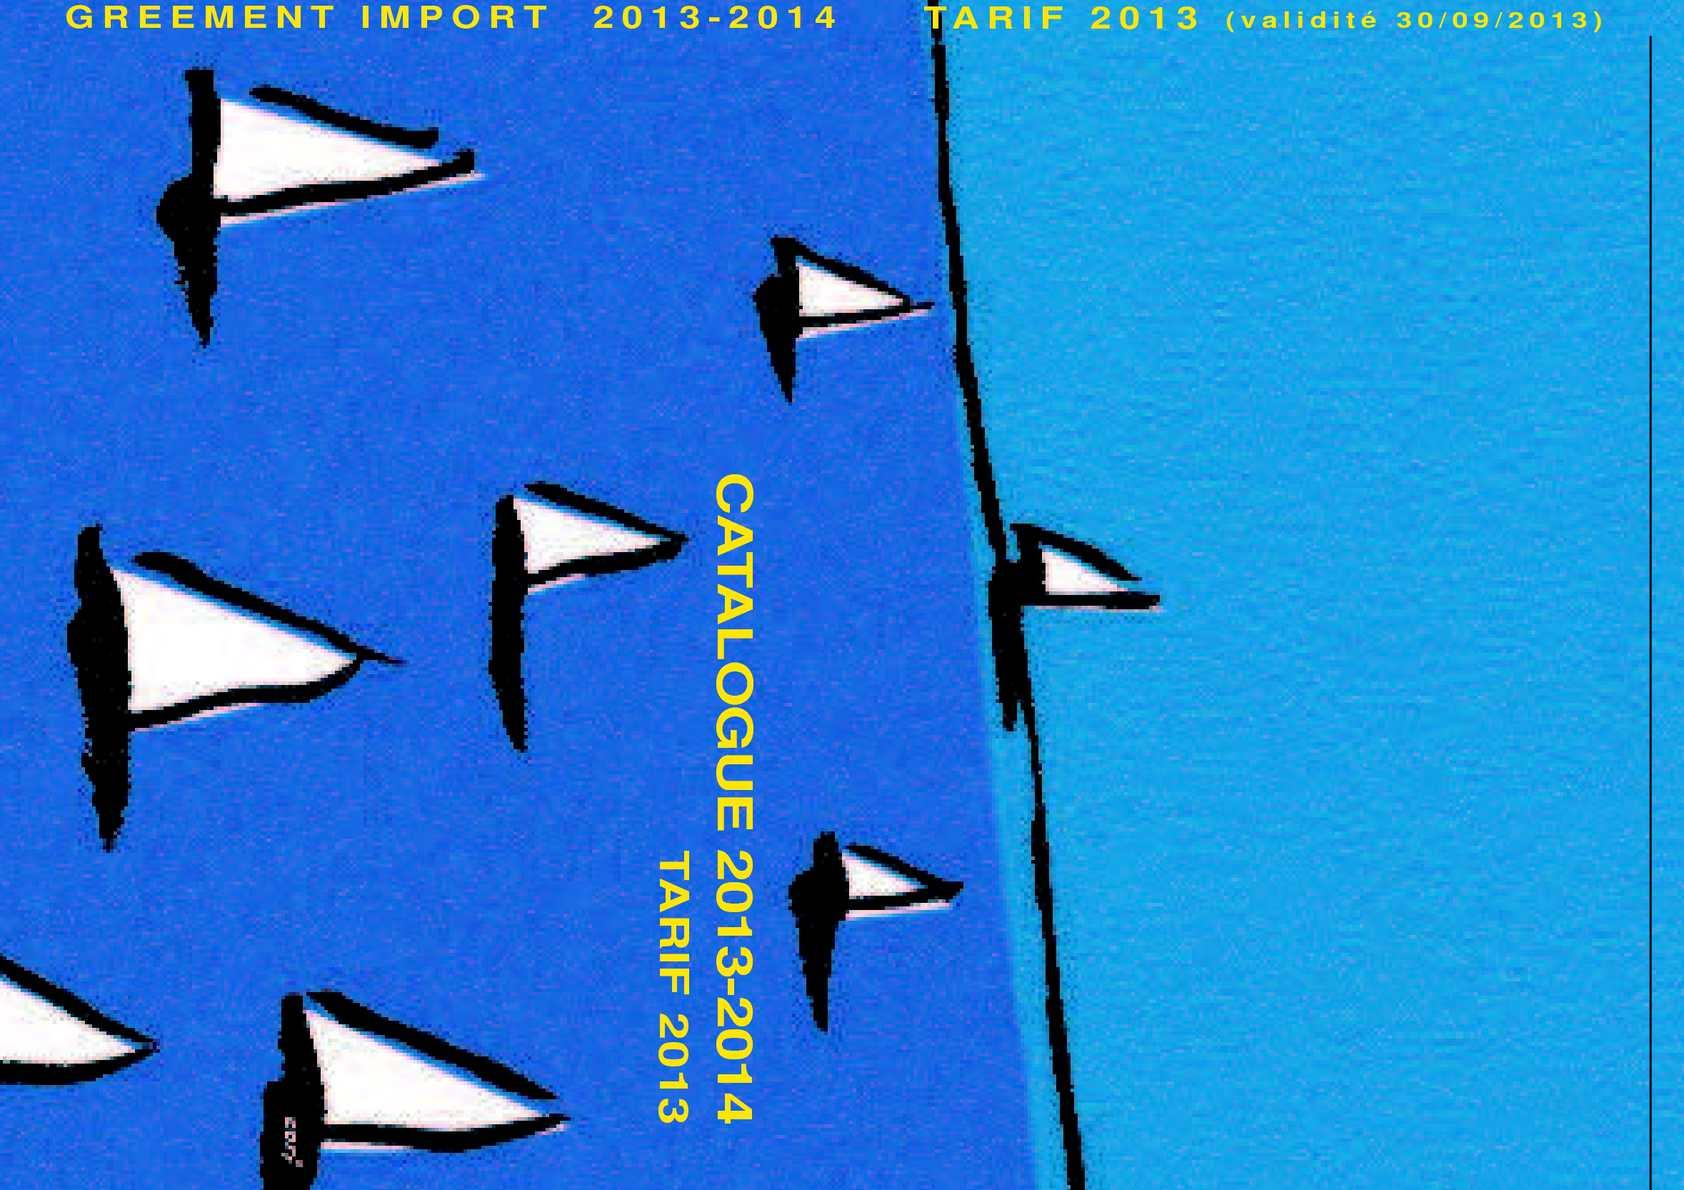 Calaméo - Catalogue Greement Import 2013-2014 322bf22a666